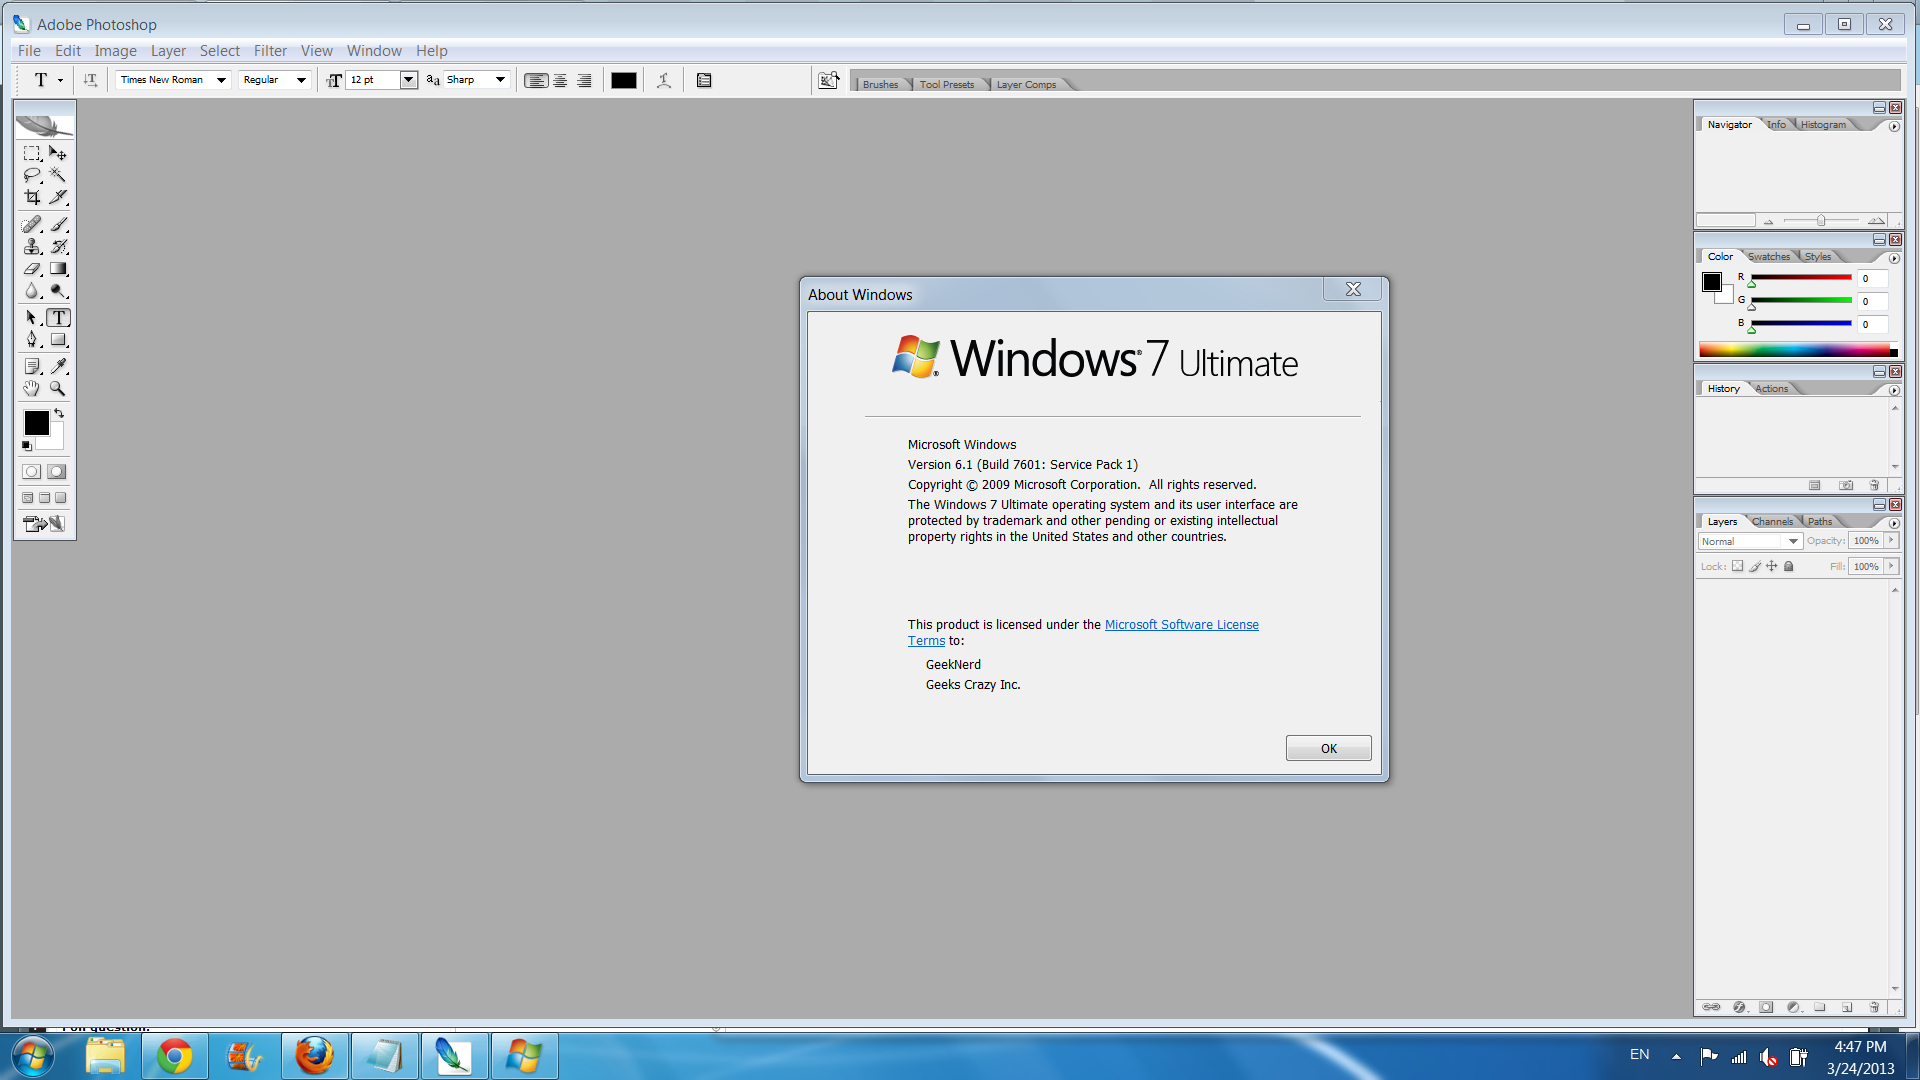 photoshop cs2 windows 7